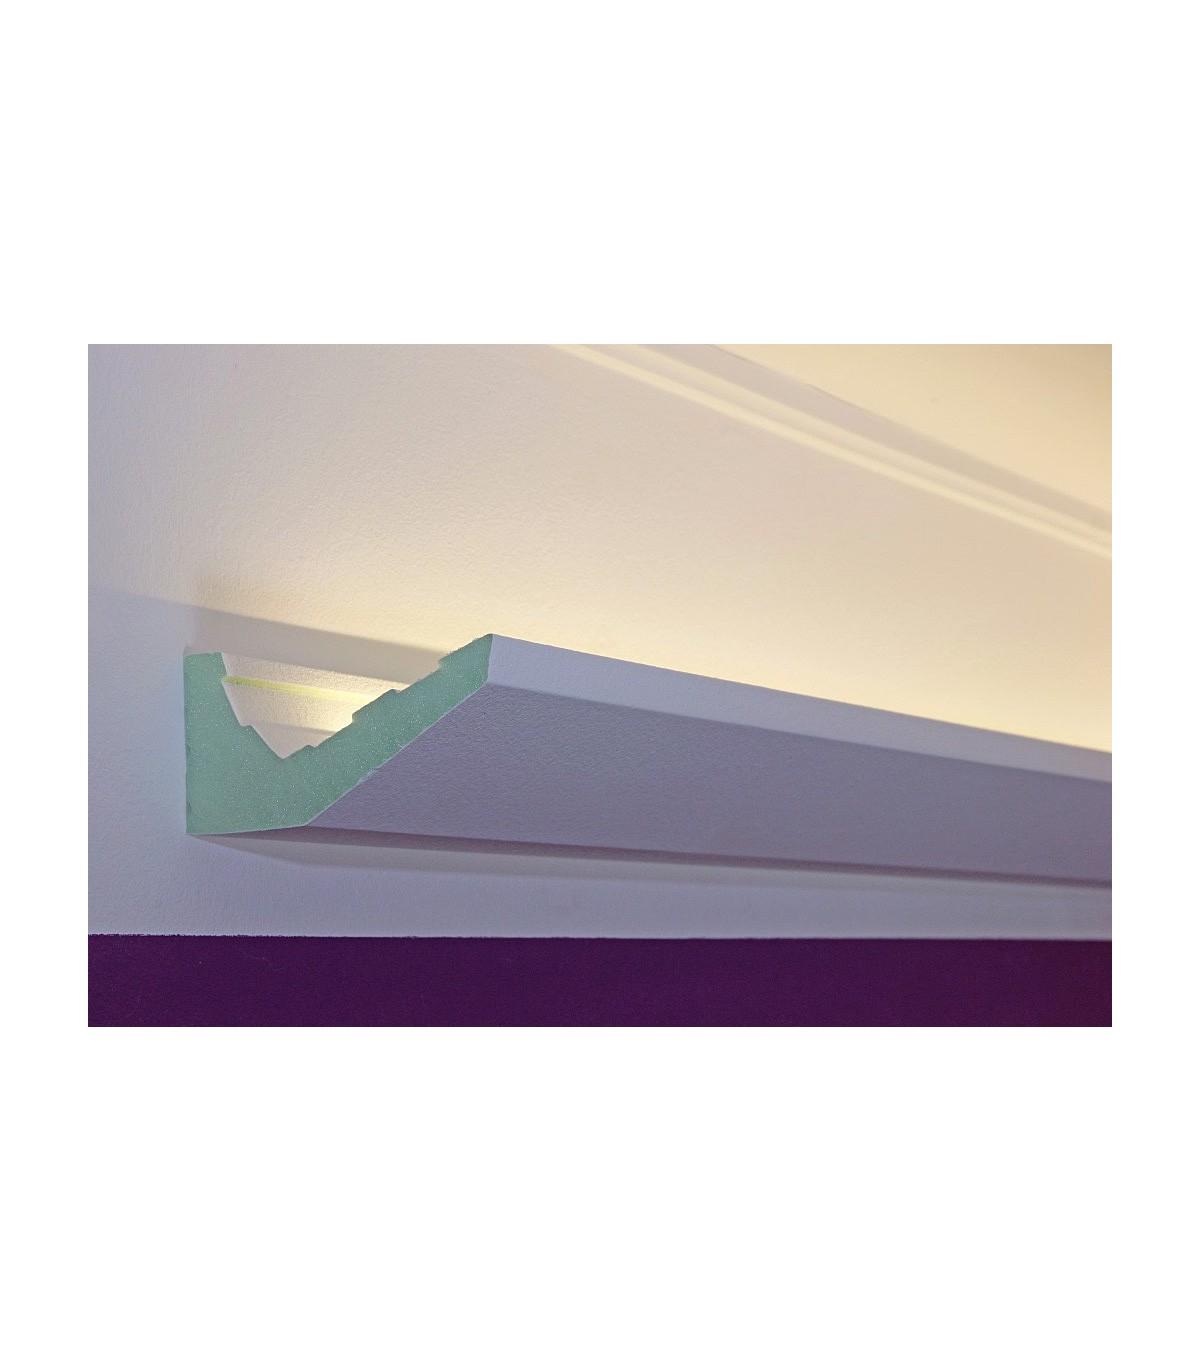 led stuckleisten dbml 120 pr f r indirekte beleuchtung decke bendu. Black Bedroom Furniture Sets. Home Design Ideas